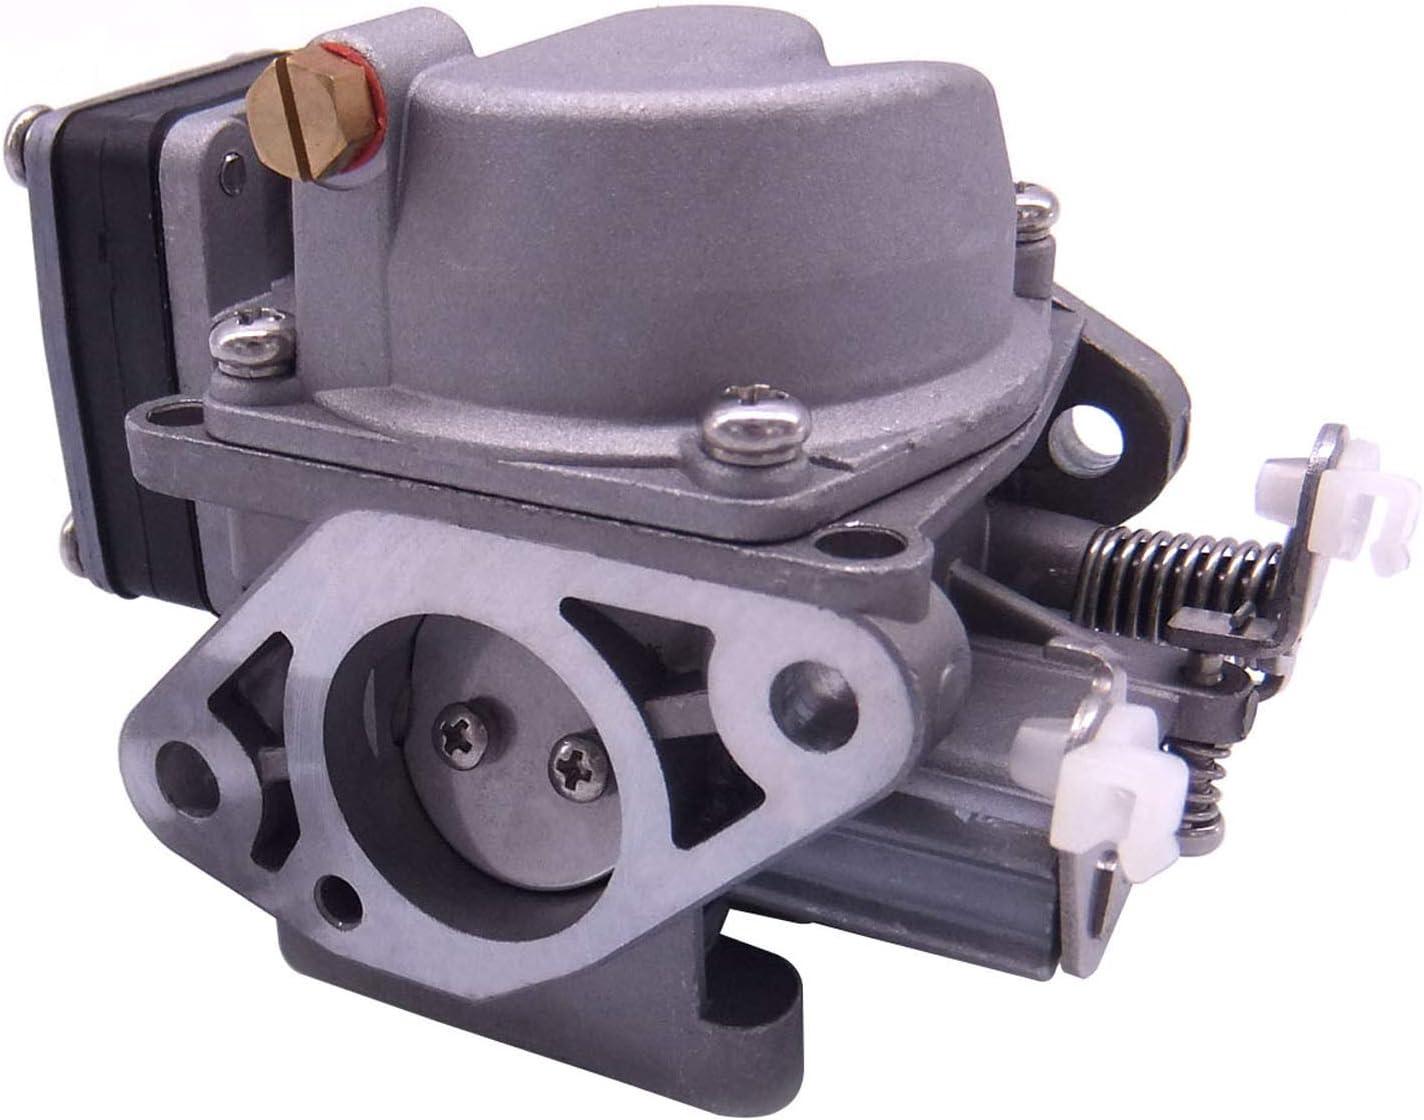 3B2-03200-1 3B2-03200 3G0-03200 Carburetor Assy for Tohatsu Nissan 2-stroke 9.8HP M9.8 NS9.8 Outboard motors